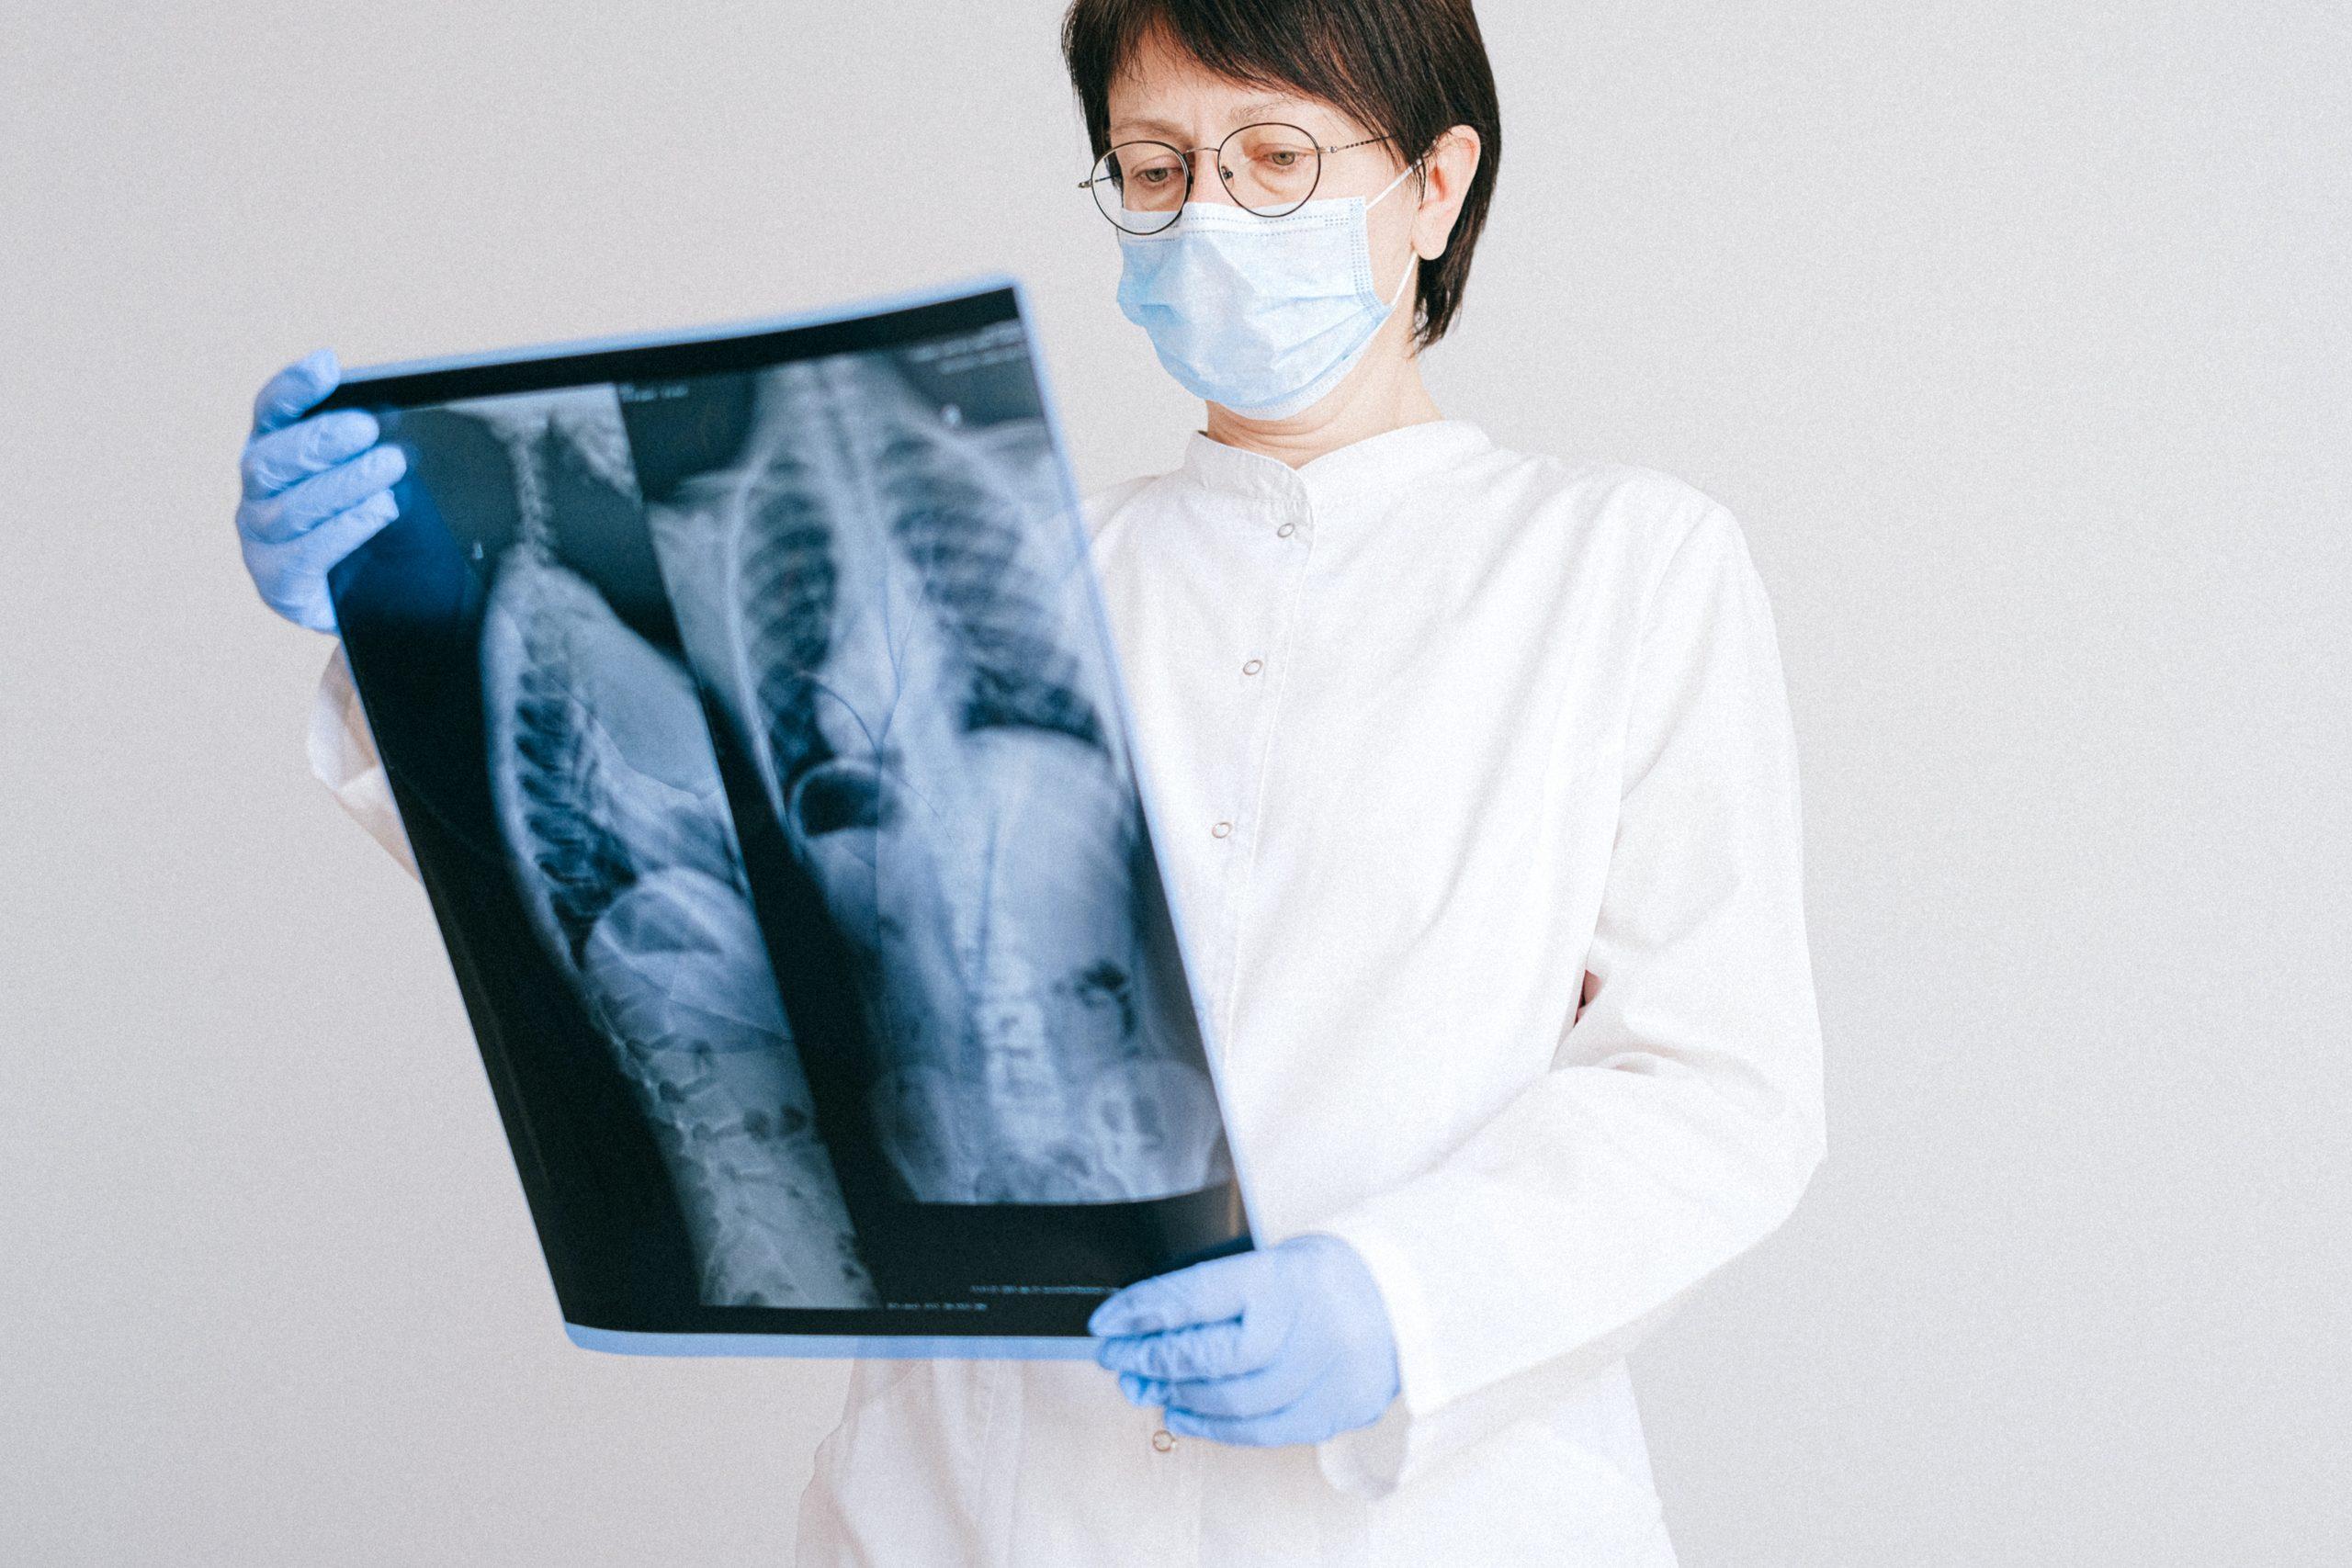 Luftveissykdommer